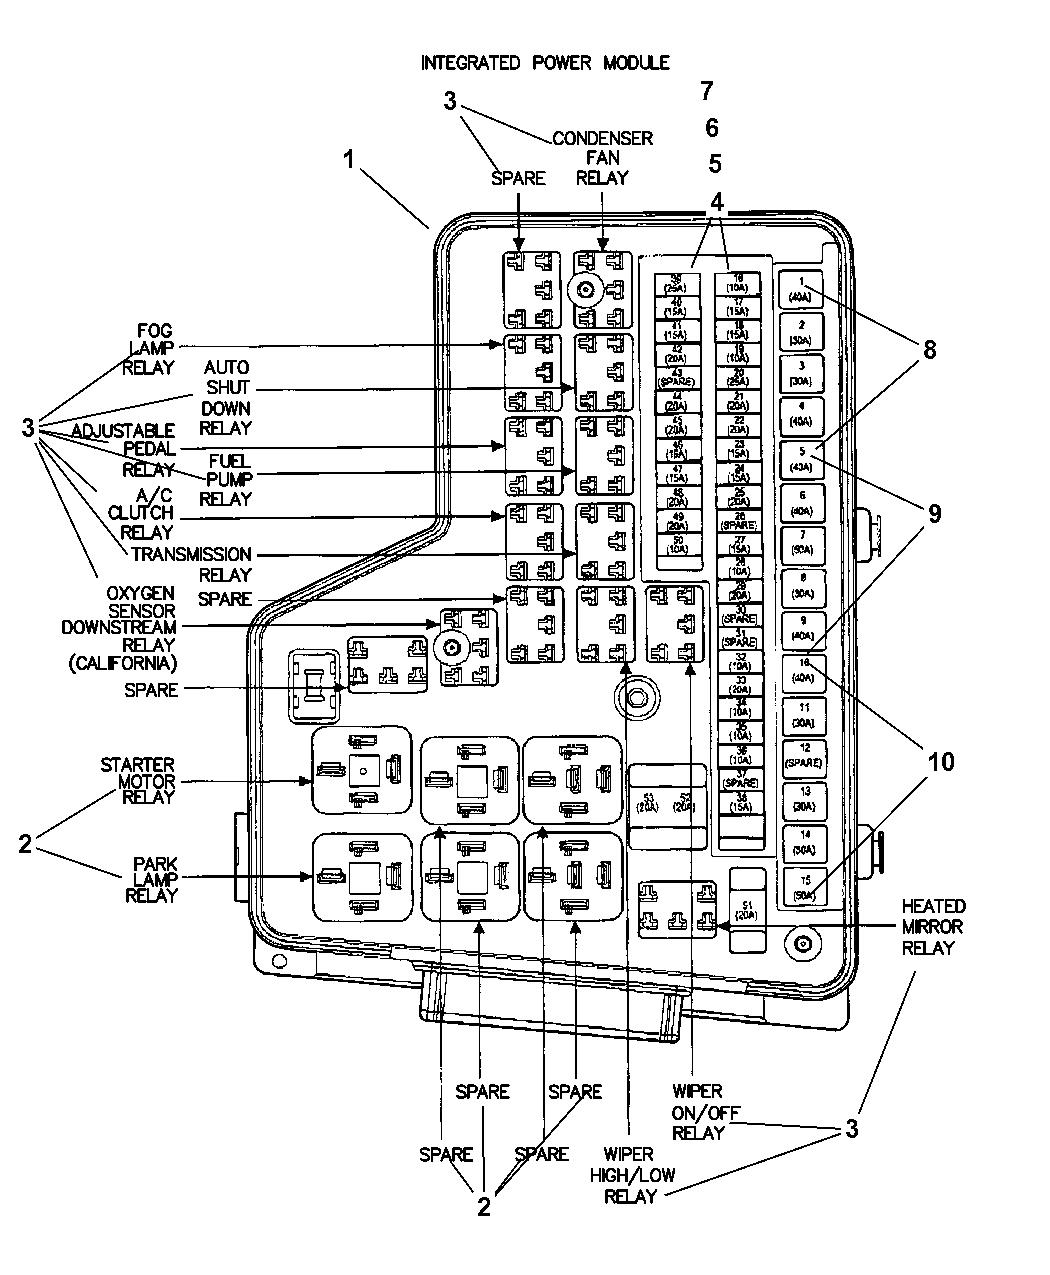 2002 dodge ram 1500 power distribution center, fuses \u0026 relays 2002 Chevrolet Suburban Fuse Panel 2002 Dodge Ram Fuse Panel #6